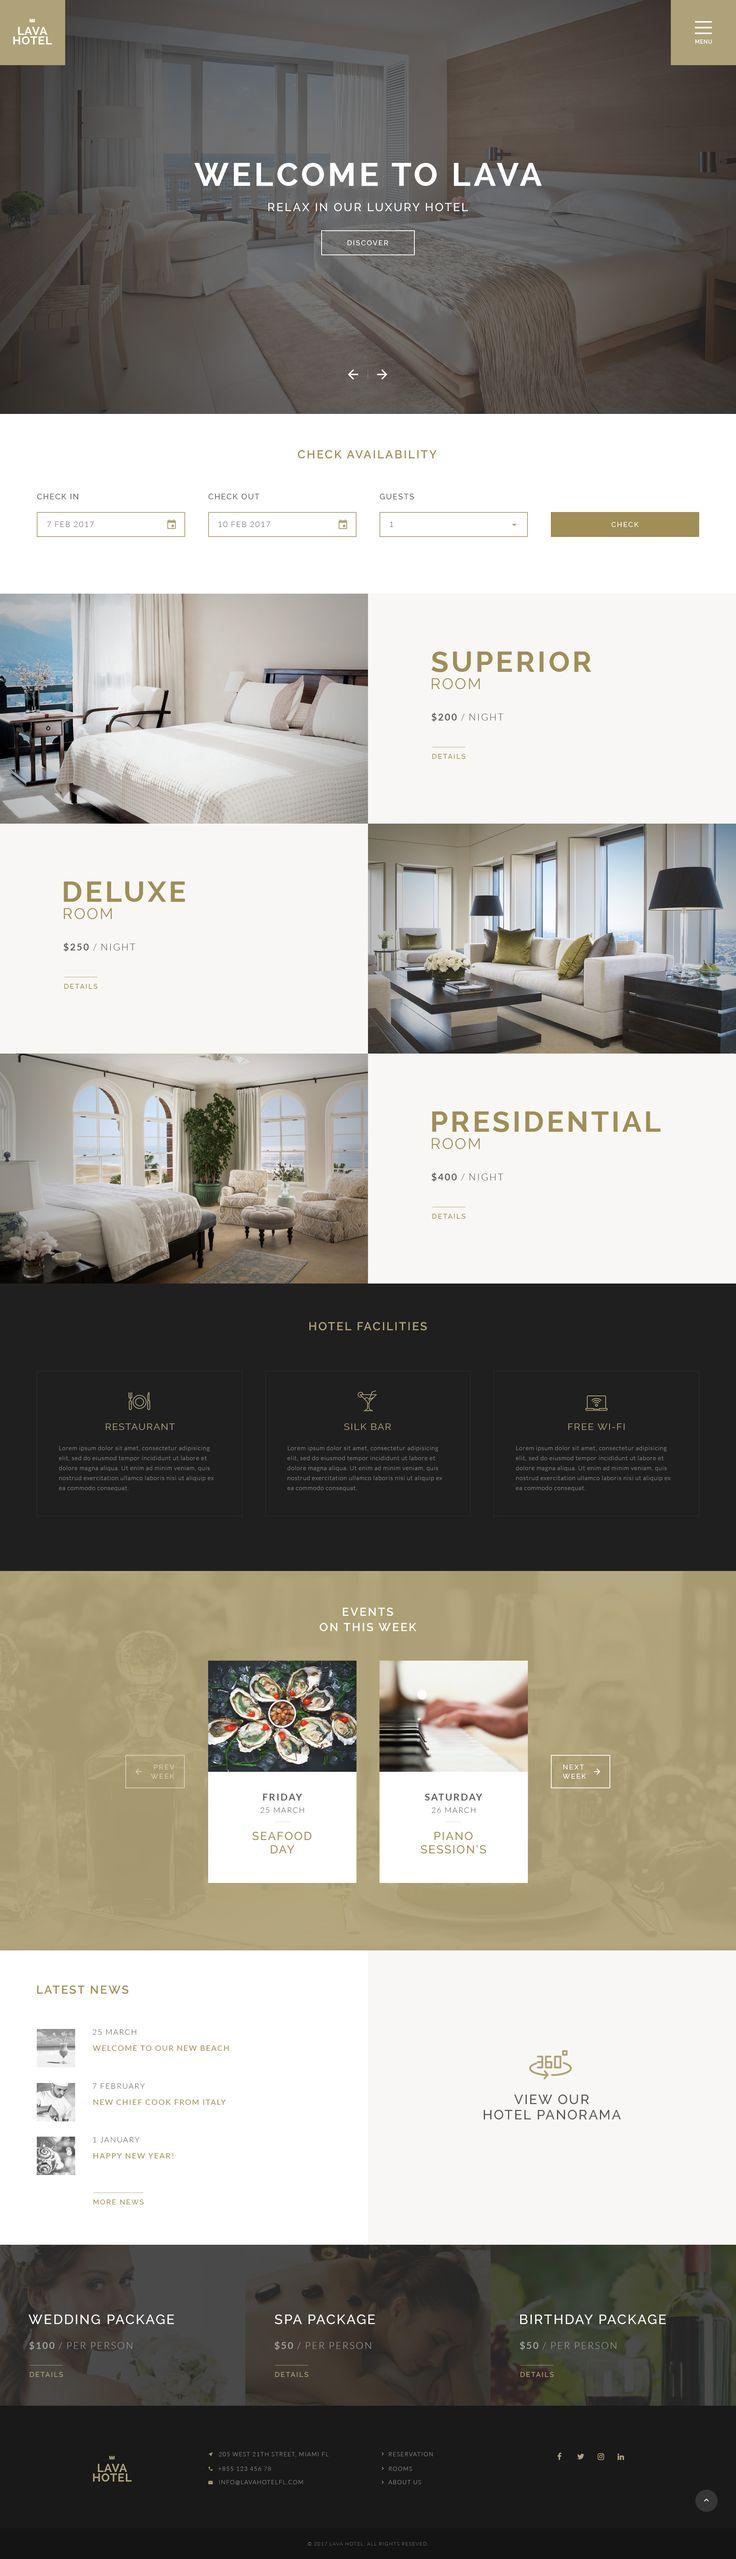 LAVA - Luxury Hotel PSD Template #hostel #hotel #luxury • Download ➝ https://themeforest.net/item/lava-luxury-hotel-psd-template/19215707?ref=pxcr